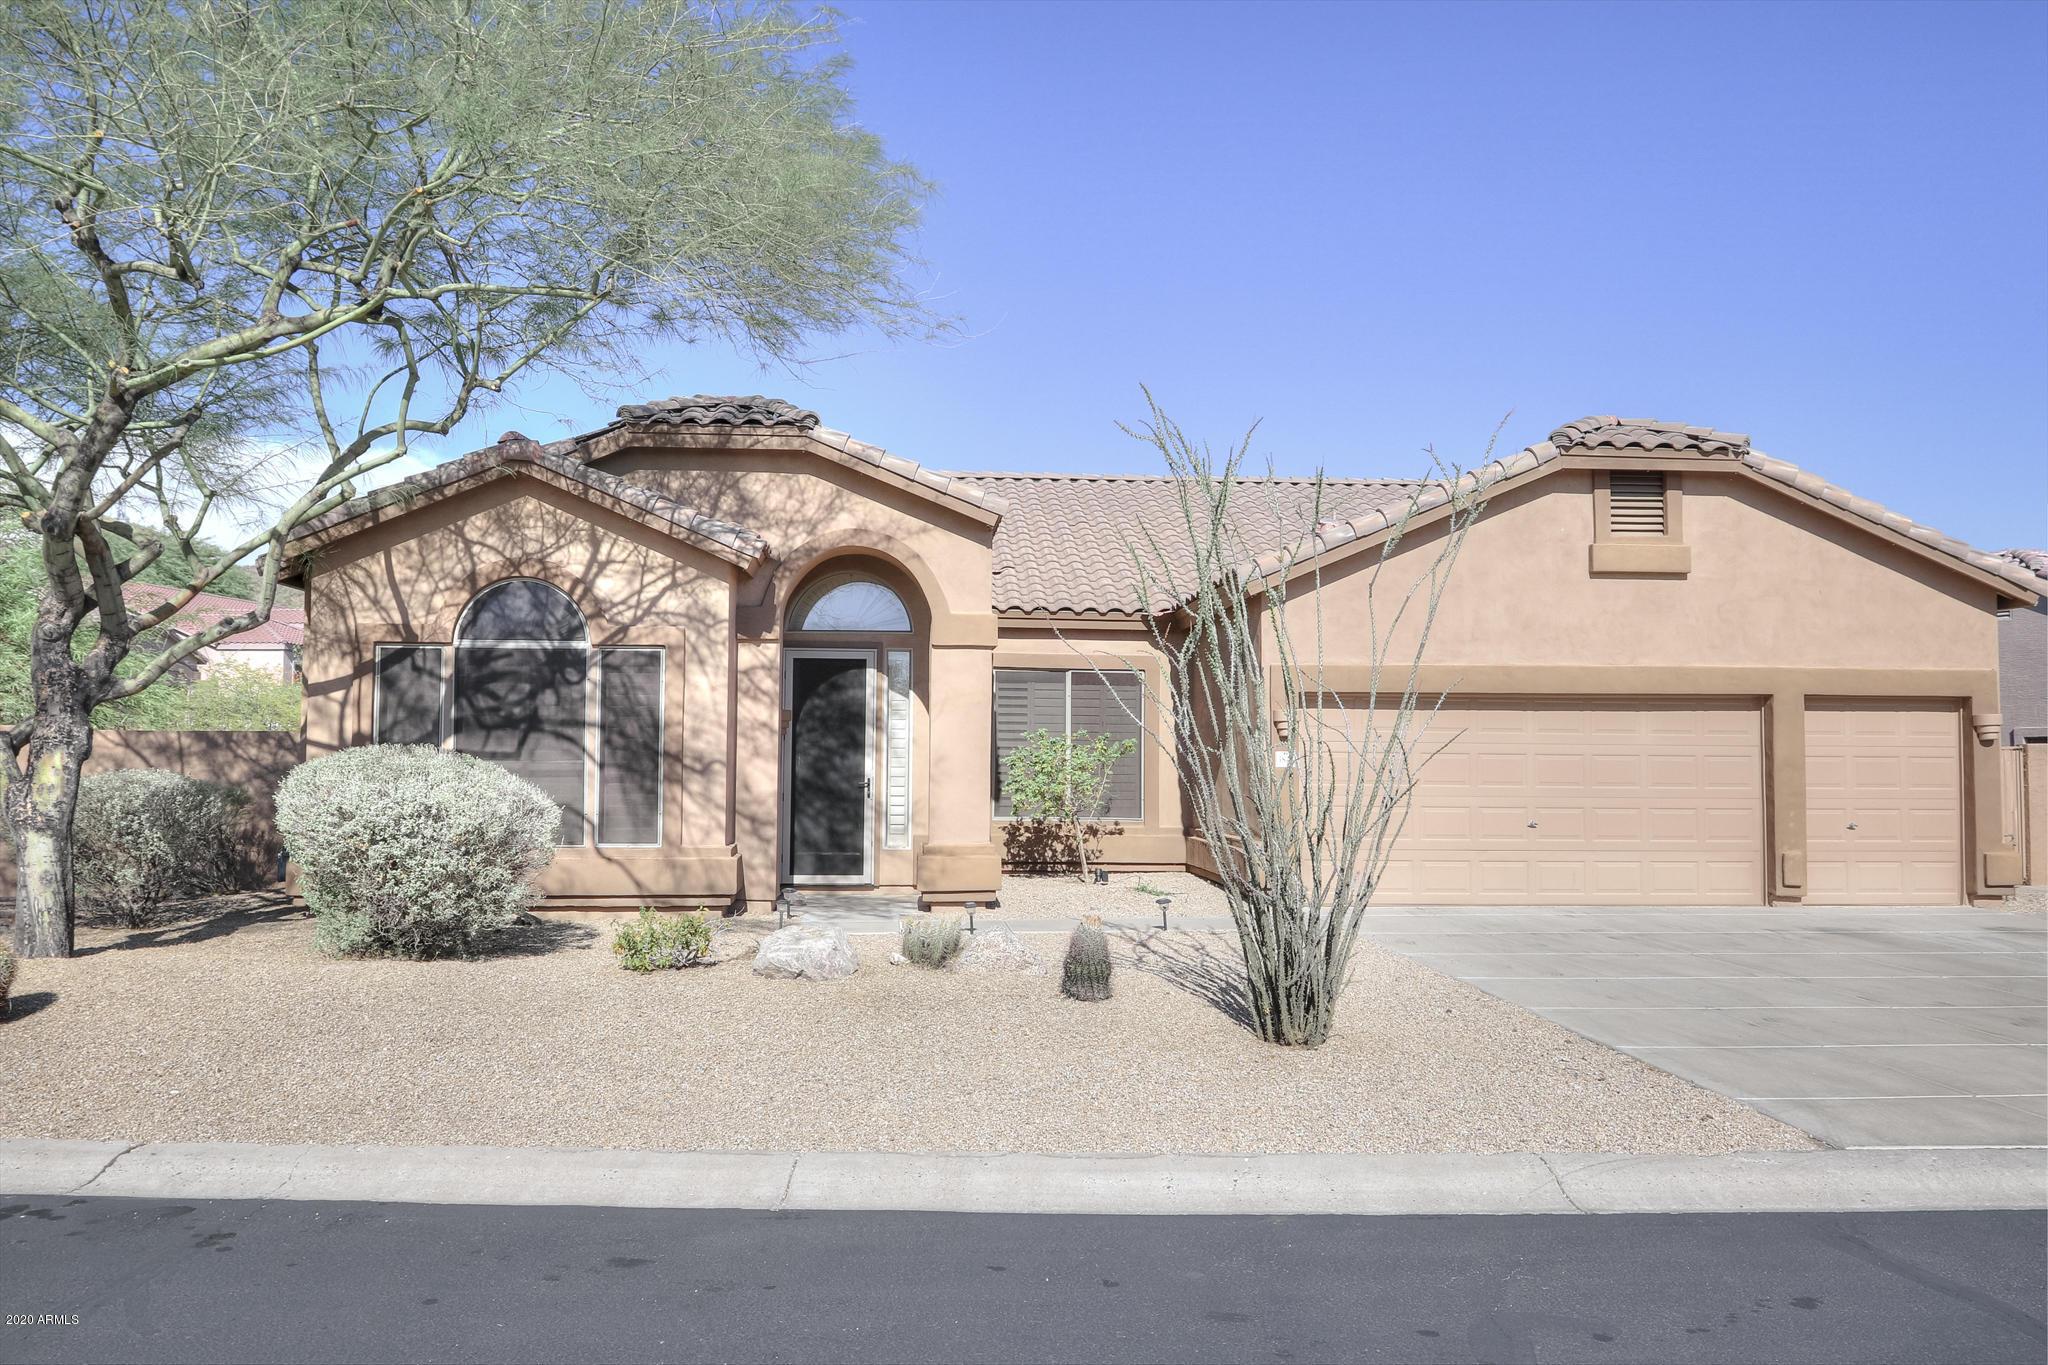 MLS 6119228 Mesa Metro Area, Mesa, AZ 85207 Mesa Homes for Rent